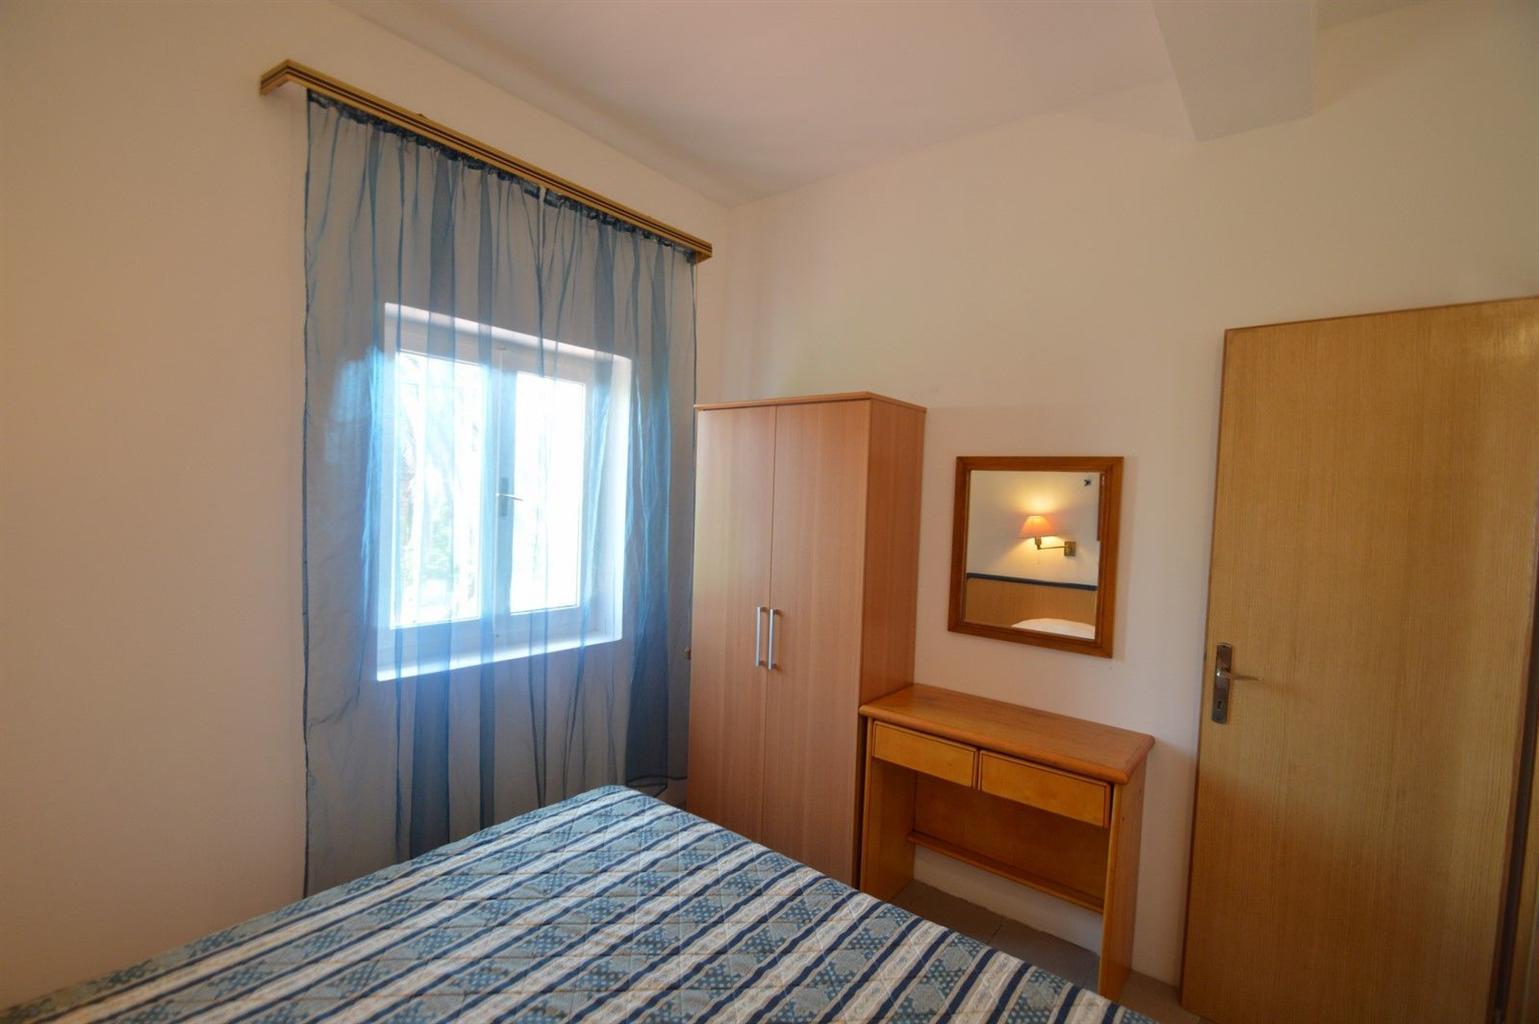 Ferienwohnung Ferienwohnungen GOGA 23531-A3 (2021392), Mali Lošinj, Insel Losinj, Kvarner, Kroatien, Bild 13